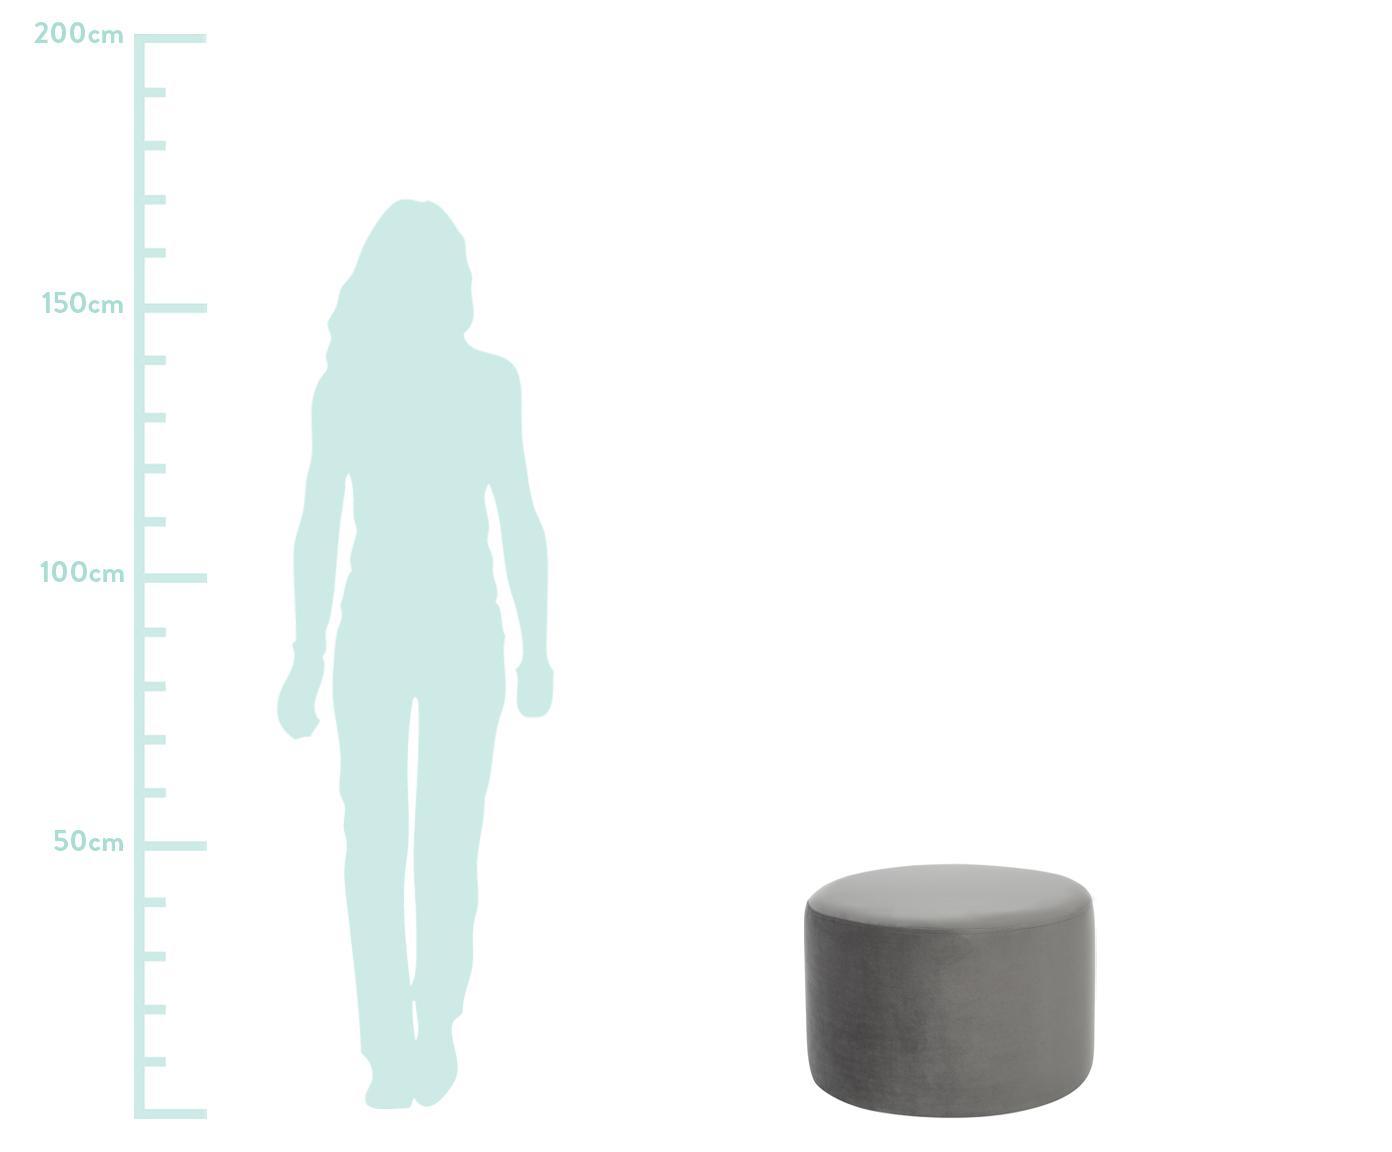 Samt-Hocker Daisy, Bezug: Samt (Polyester) 25.000 S, Rahmen: Sperrholz, Samt Grau, ∅ 54 x H 40 cm